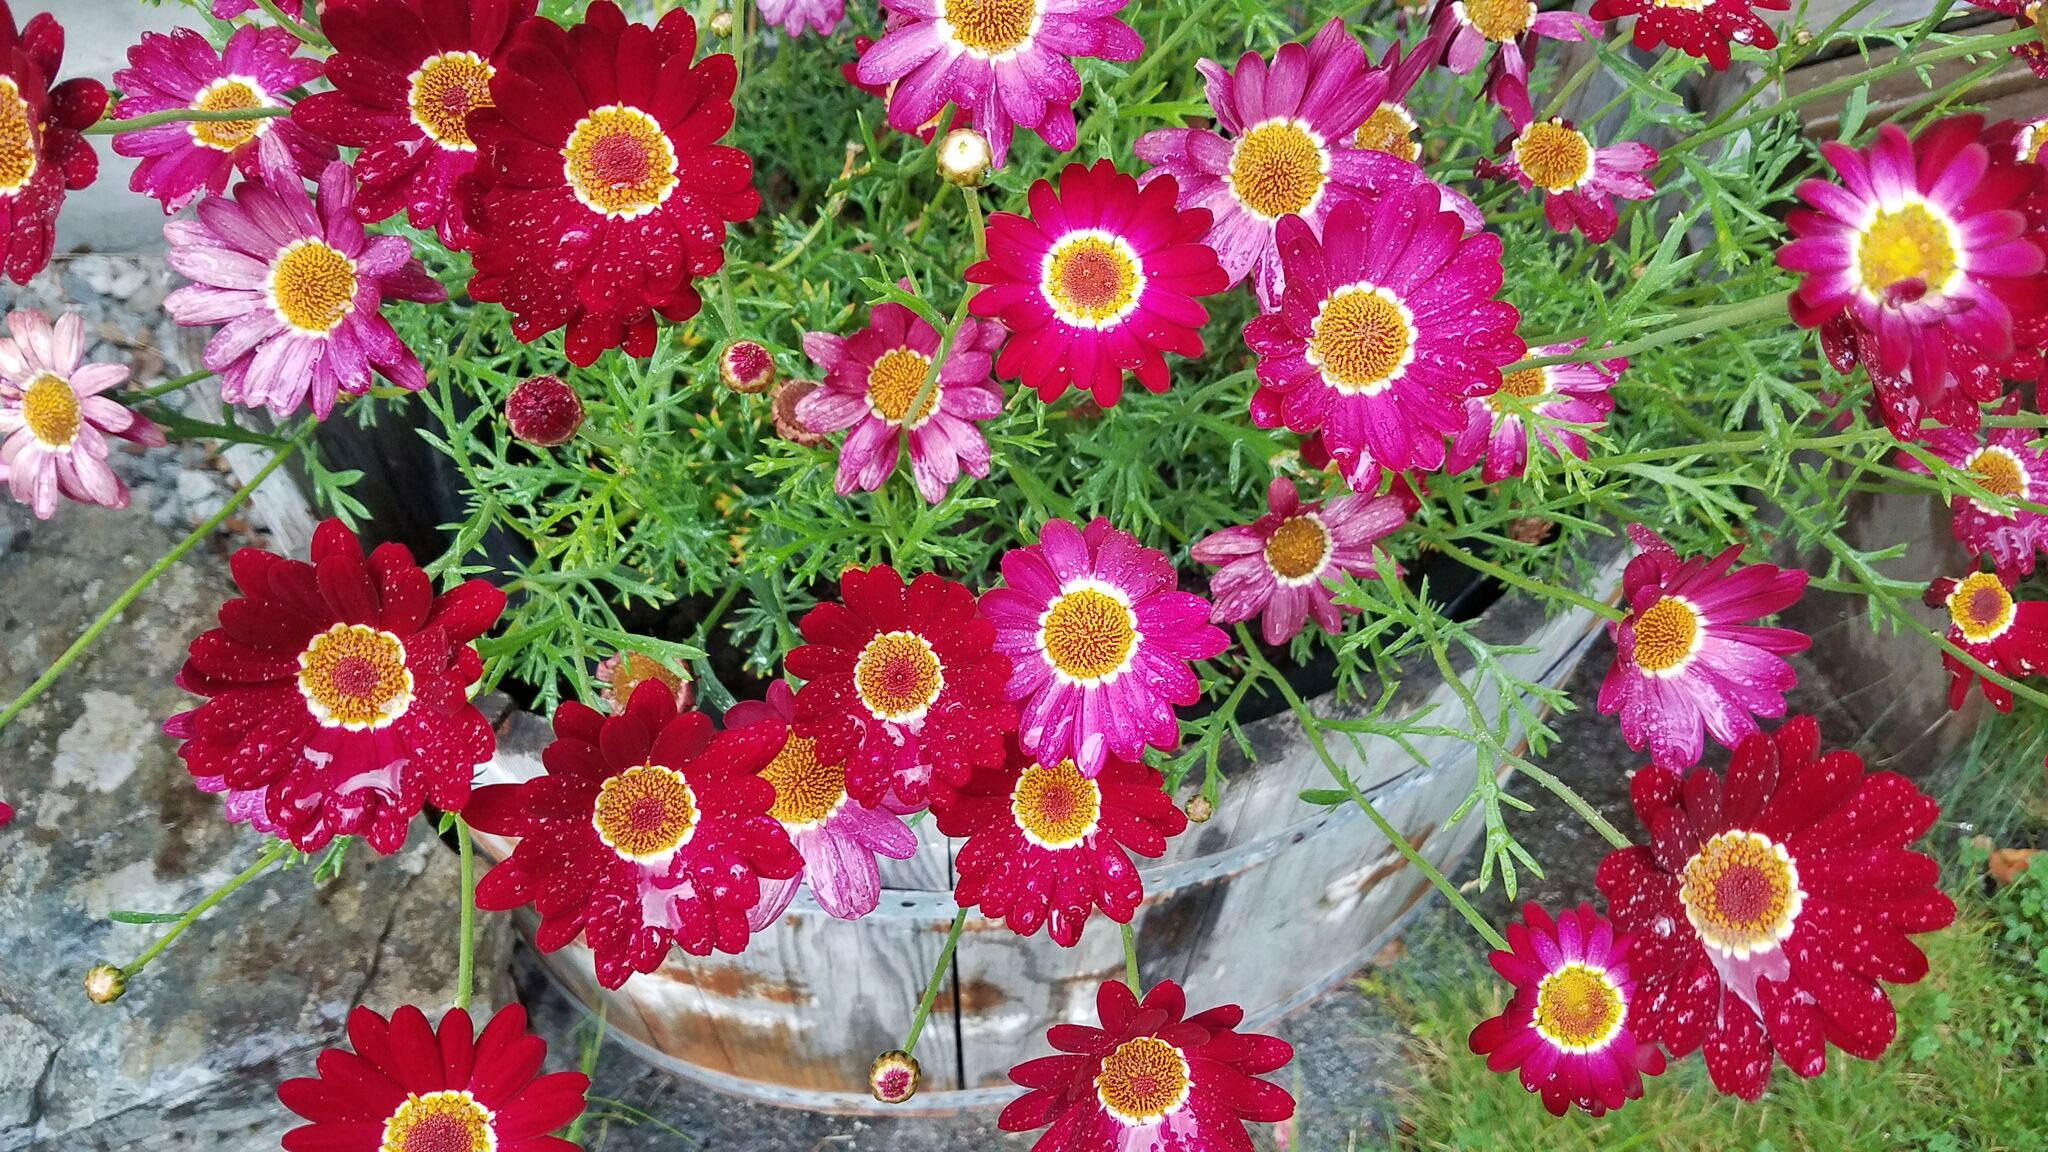 Ullensvang-gjesteheim-flowers